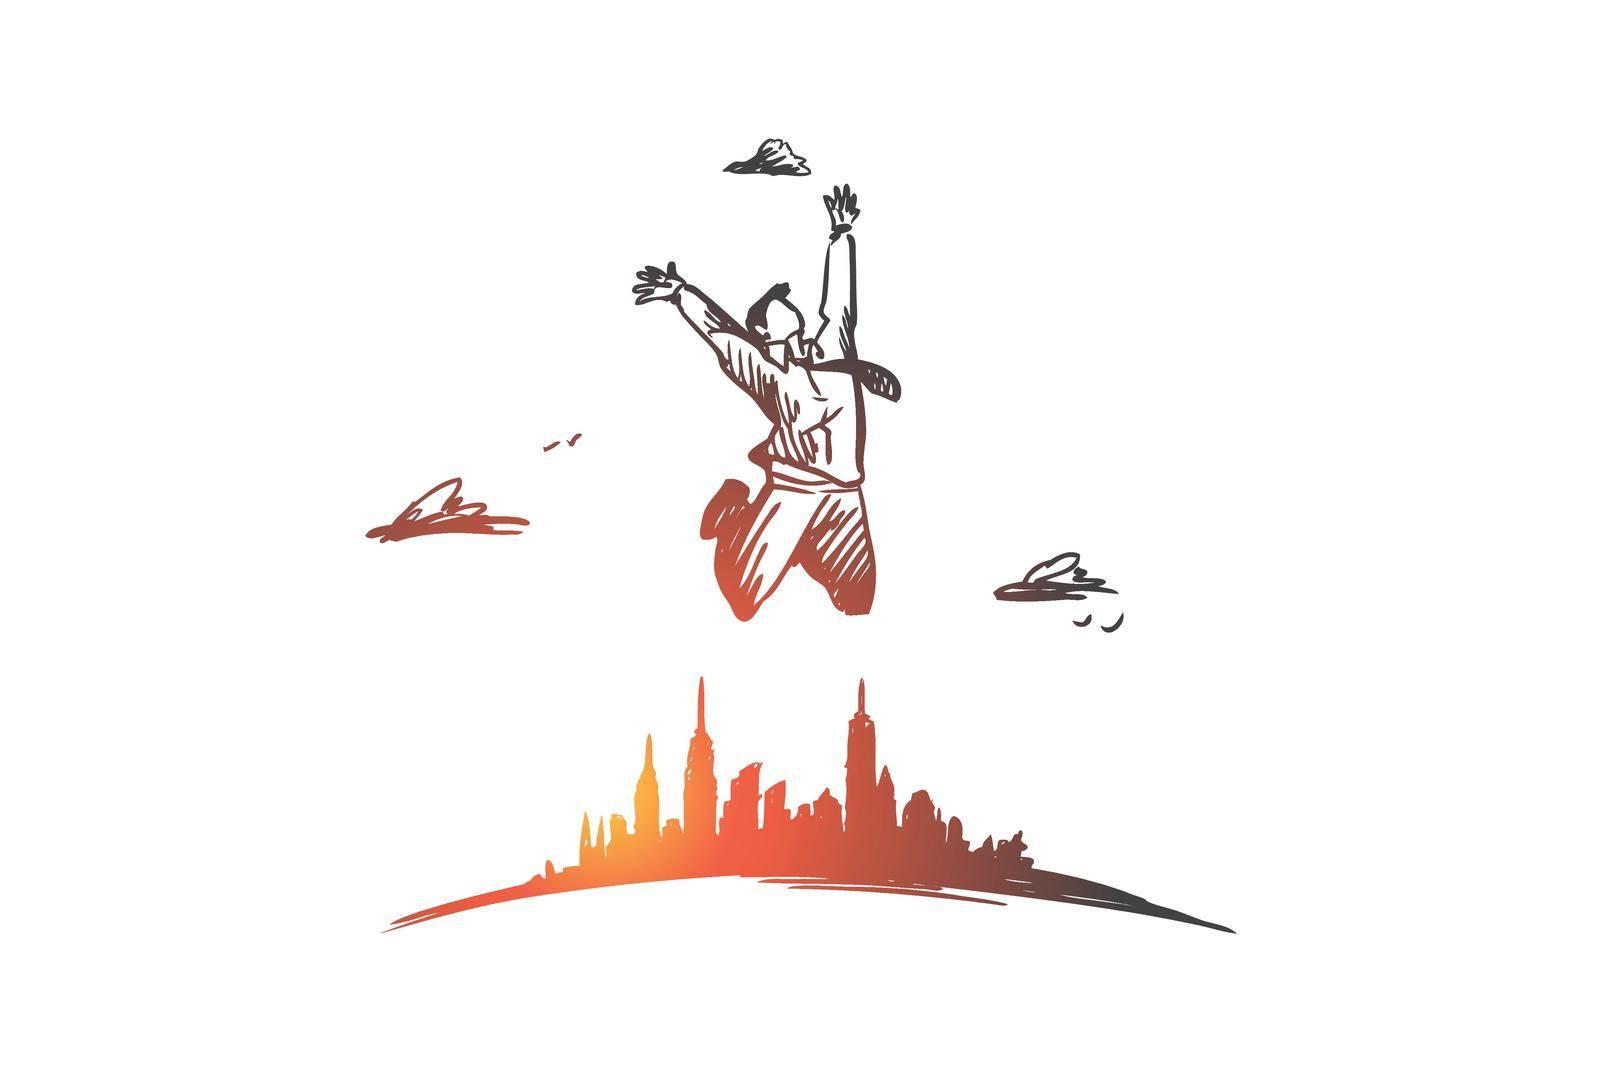 Freedom, businessman, work, happy, free concept. Hand drawn isolated vector. by Vasilyeva